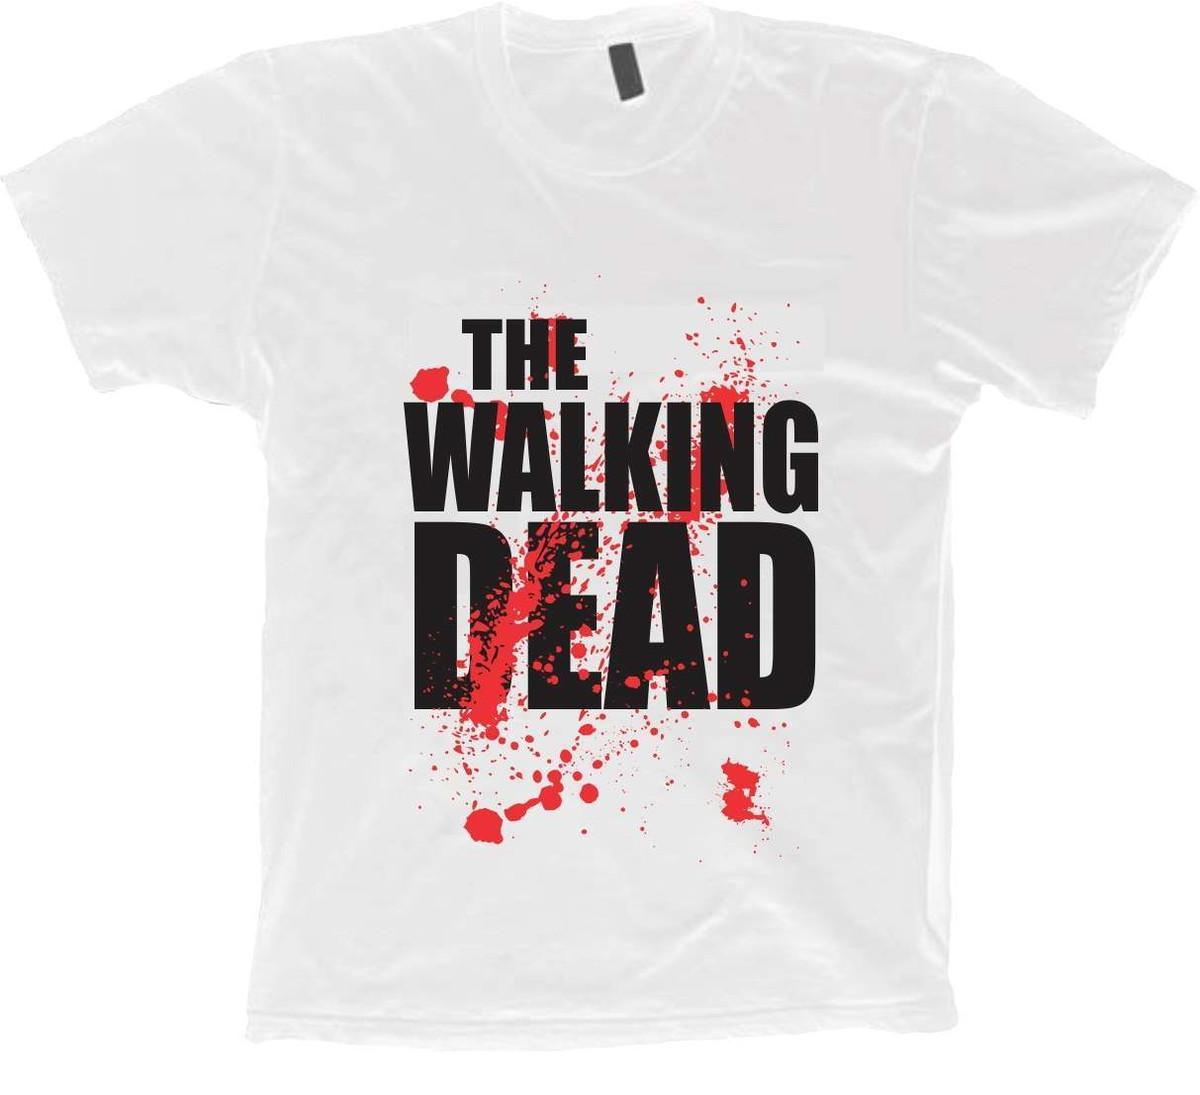 3972b4fbdb Camisetas Séries ABC - The Walking Dead - 100% Algodão!! no Elo7 ...